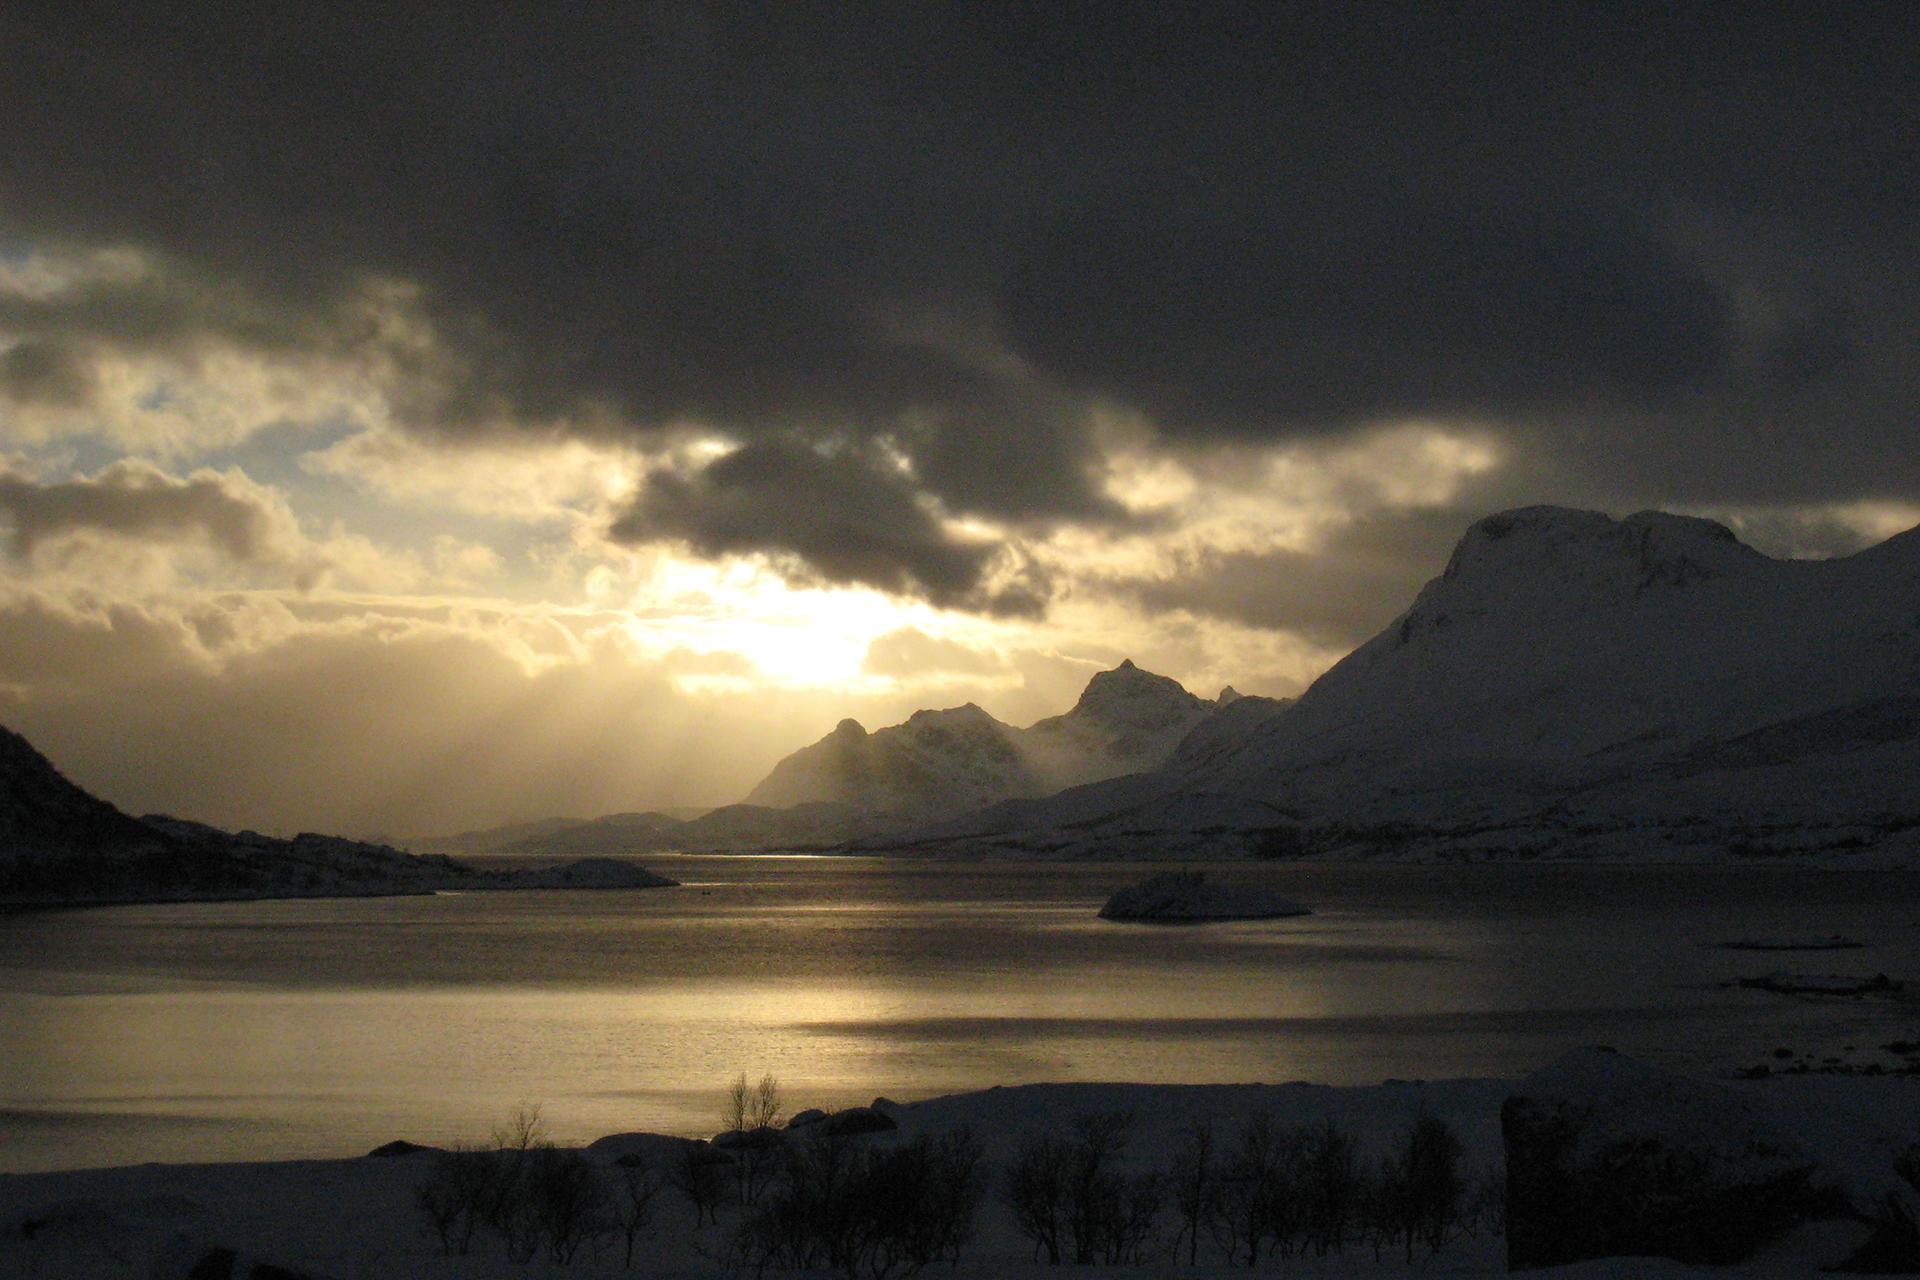 VAUDE-Visions-Wallpapers-for-free-Andreas-Prielmaier-Norway-Lofots-Liland-Scandinavia-wallpaper-wp48011673